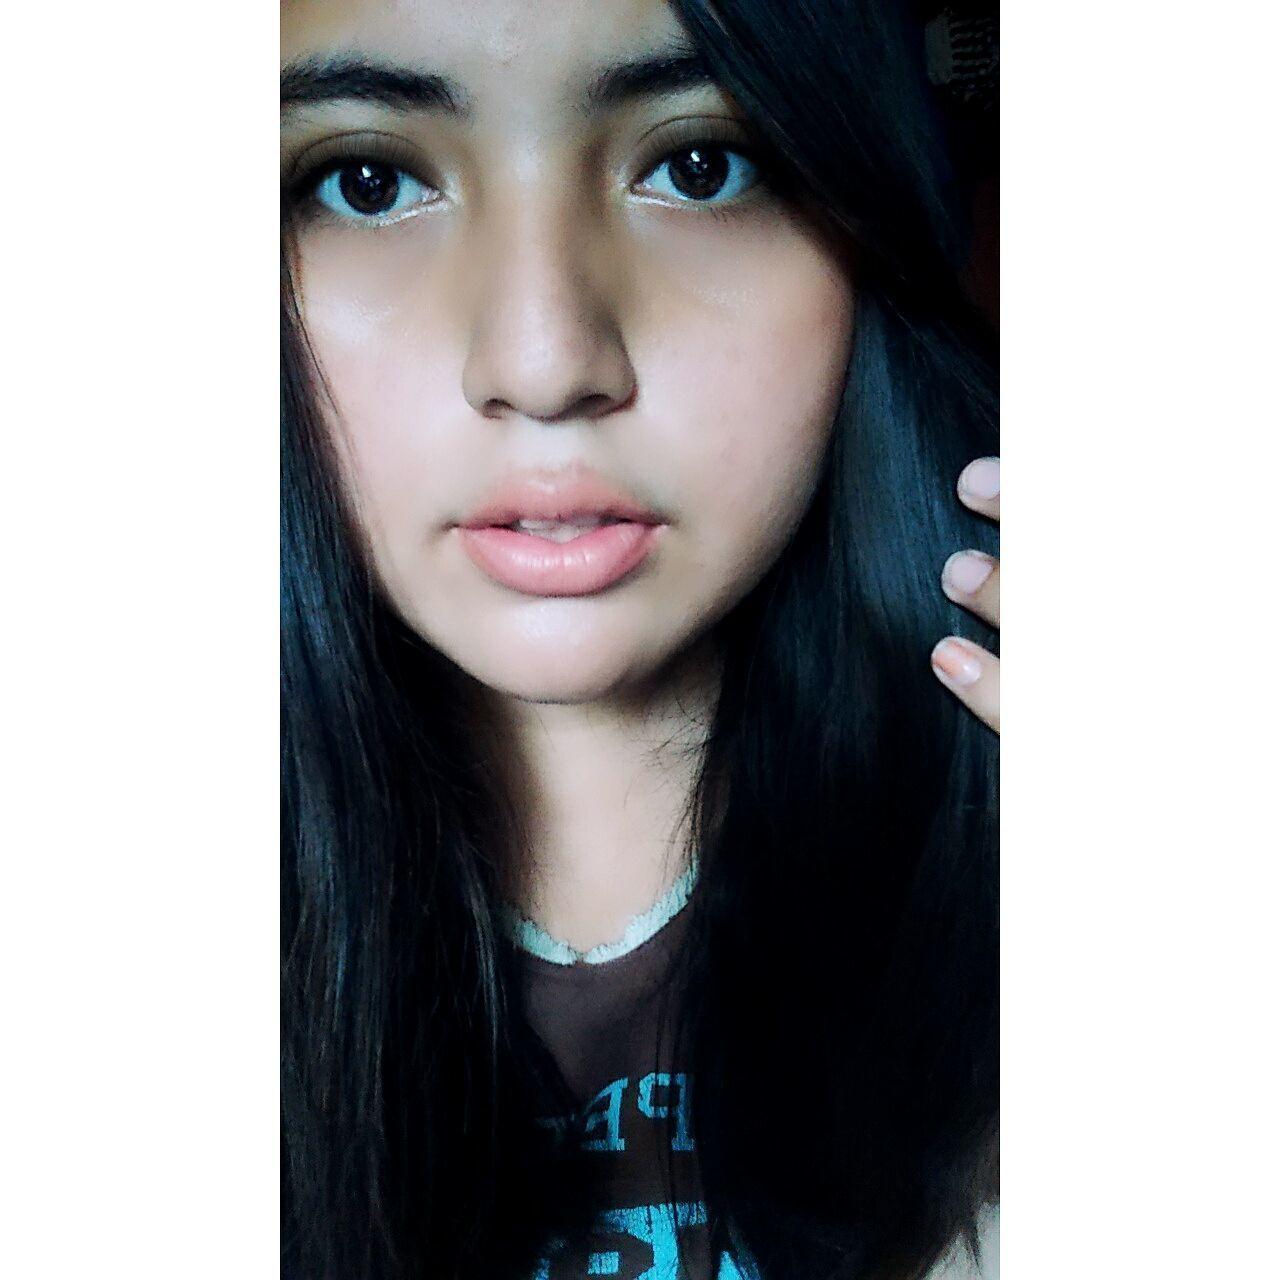 Never say never, ♥ One Person Beautiful Woman Model Beautiful Girl Hello World Beautiful ♥ girl #me eyes lips Sweet Dreams Goodgirl Beautiful Nature Love ♥